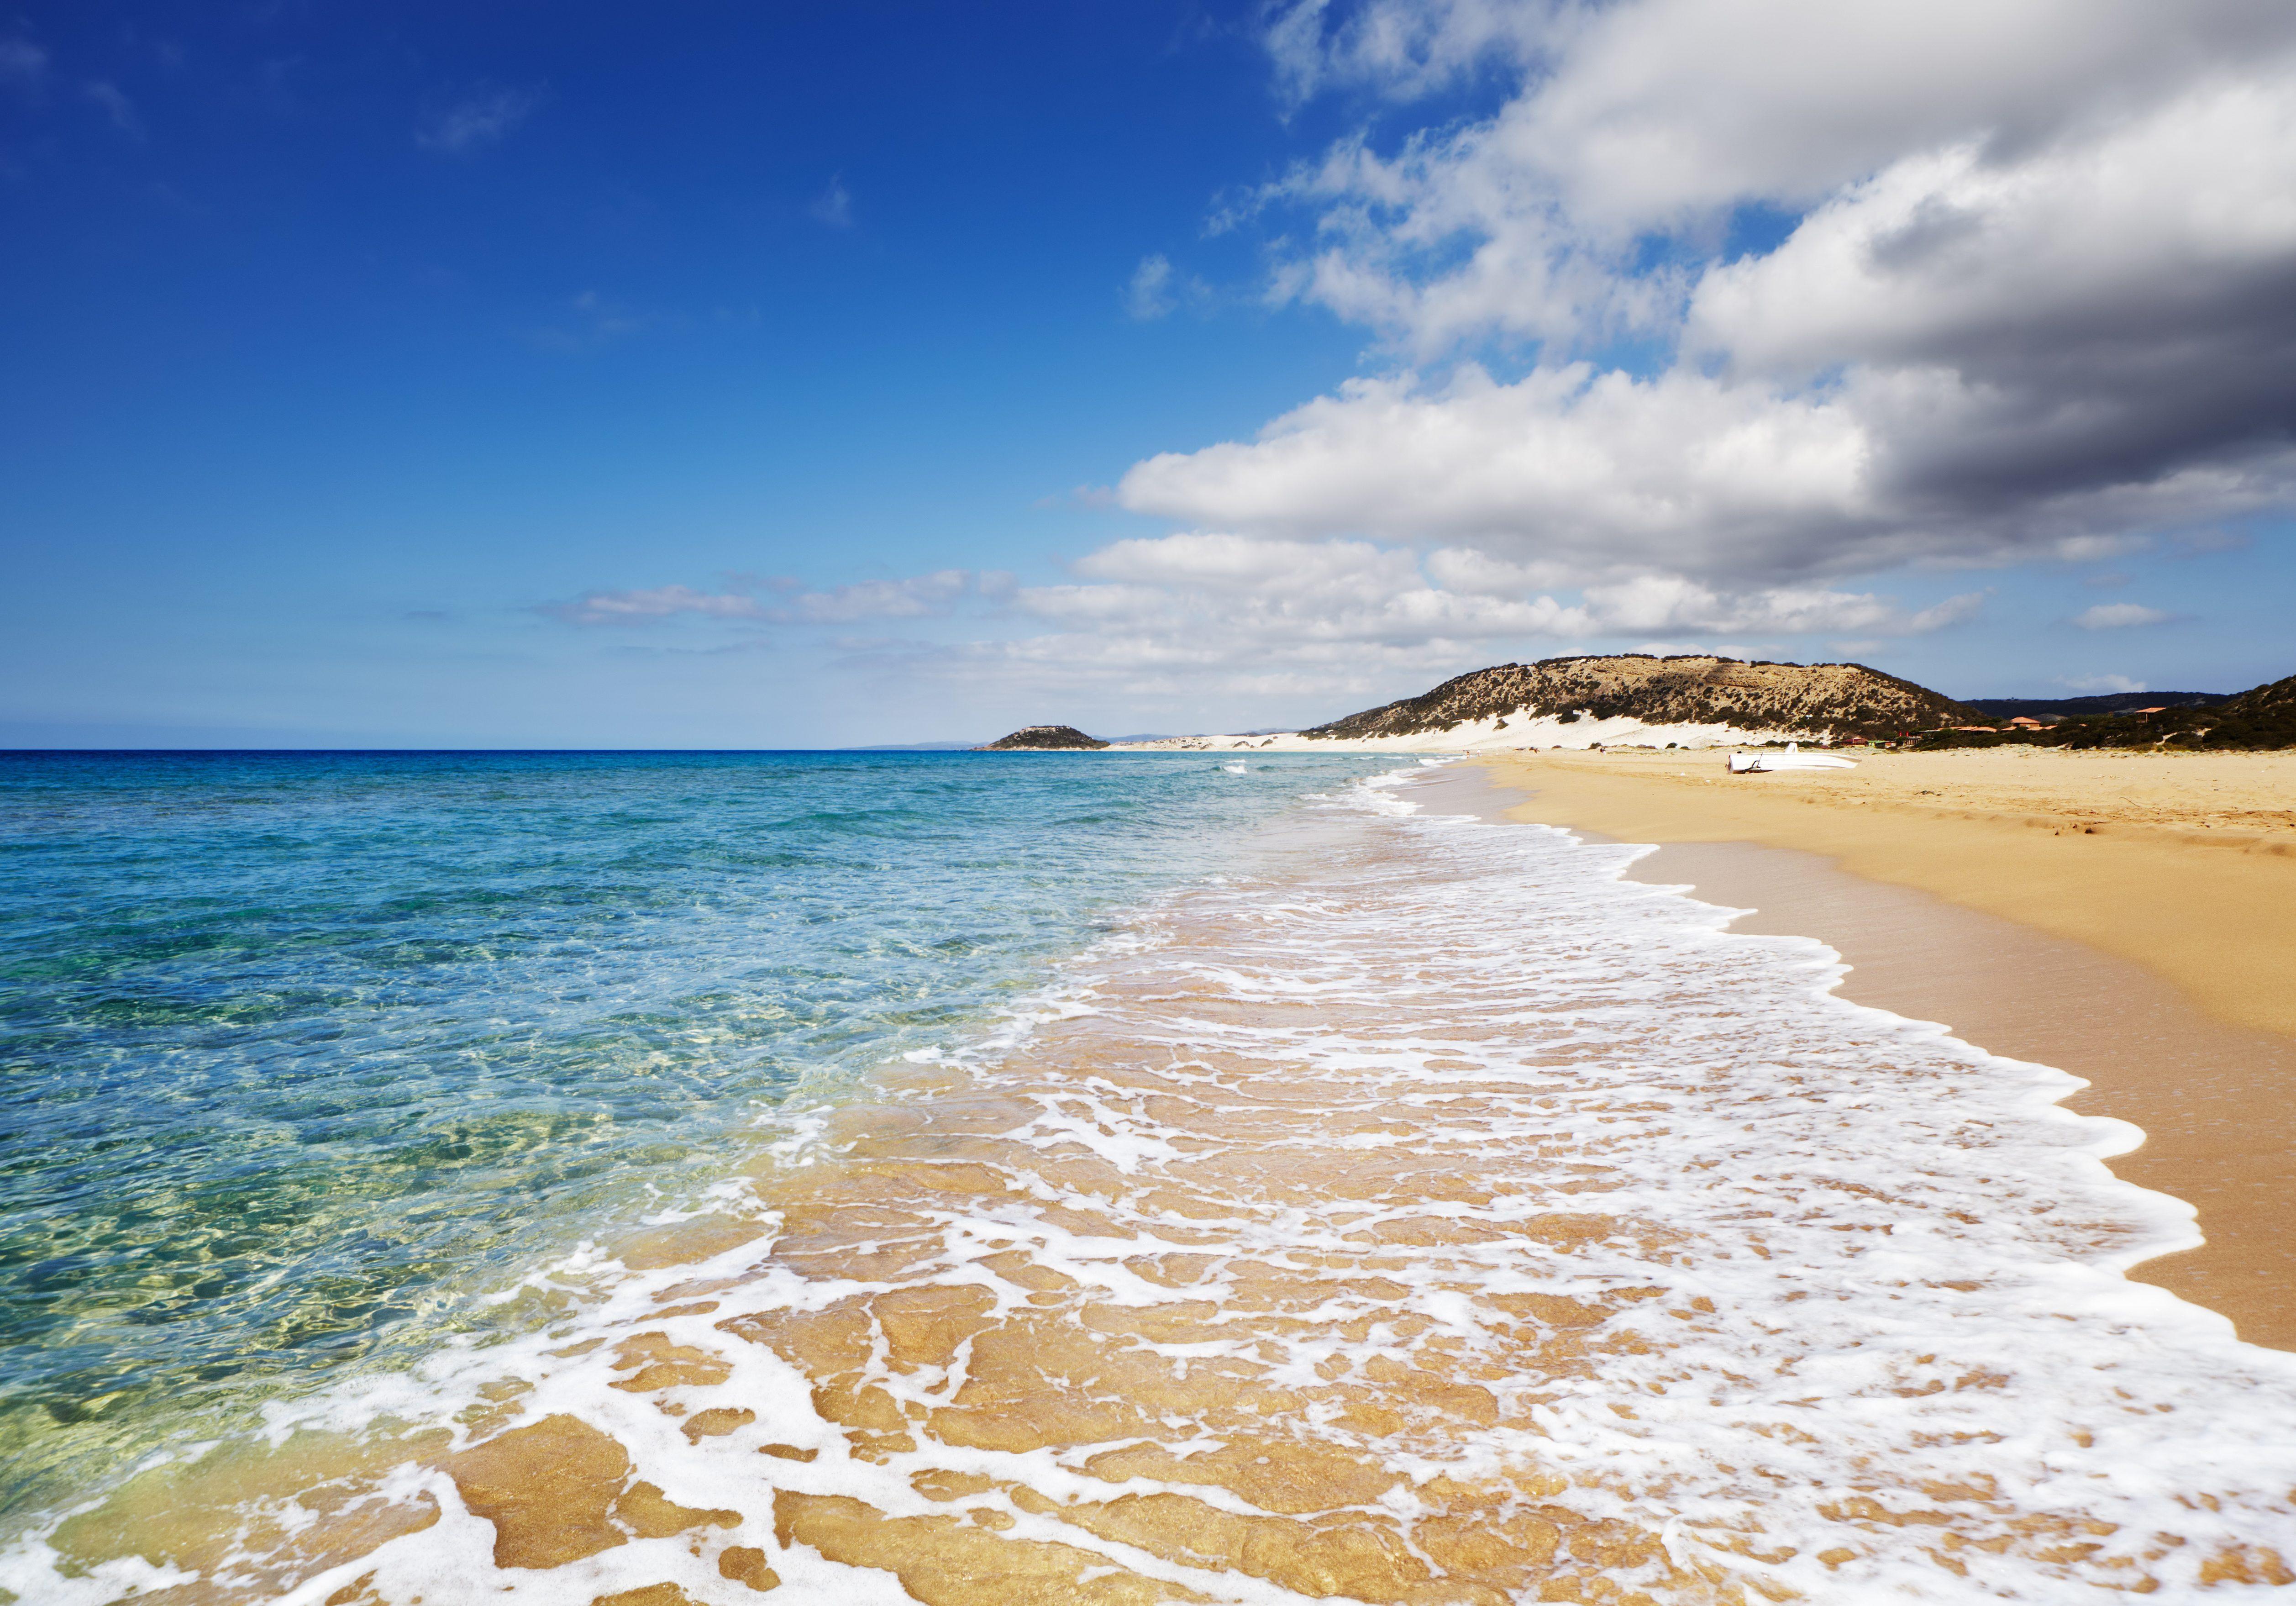 Golden Beach the best beach of Cyprus, Karpas Peninsula, North Cyprus